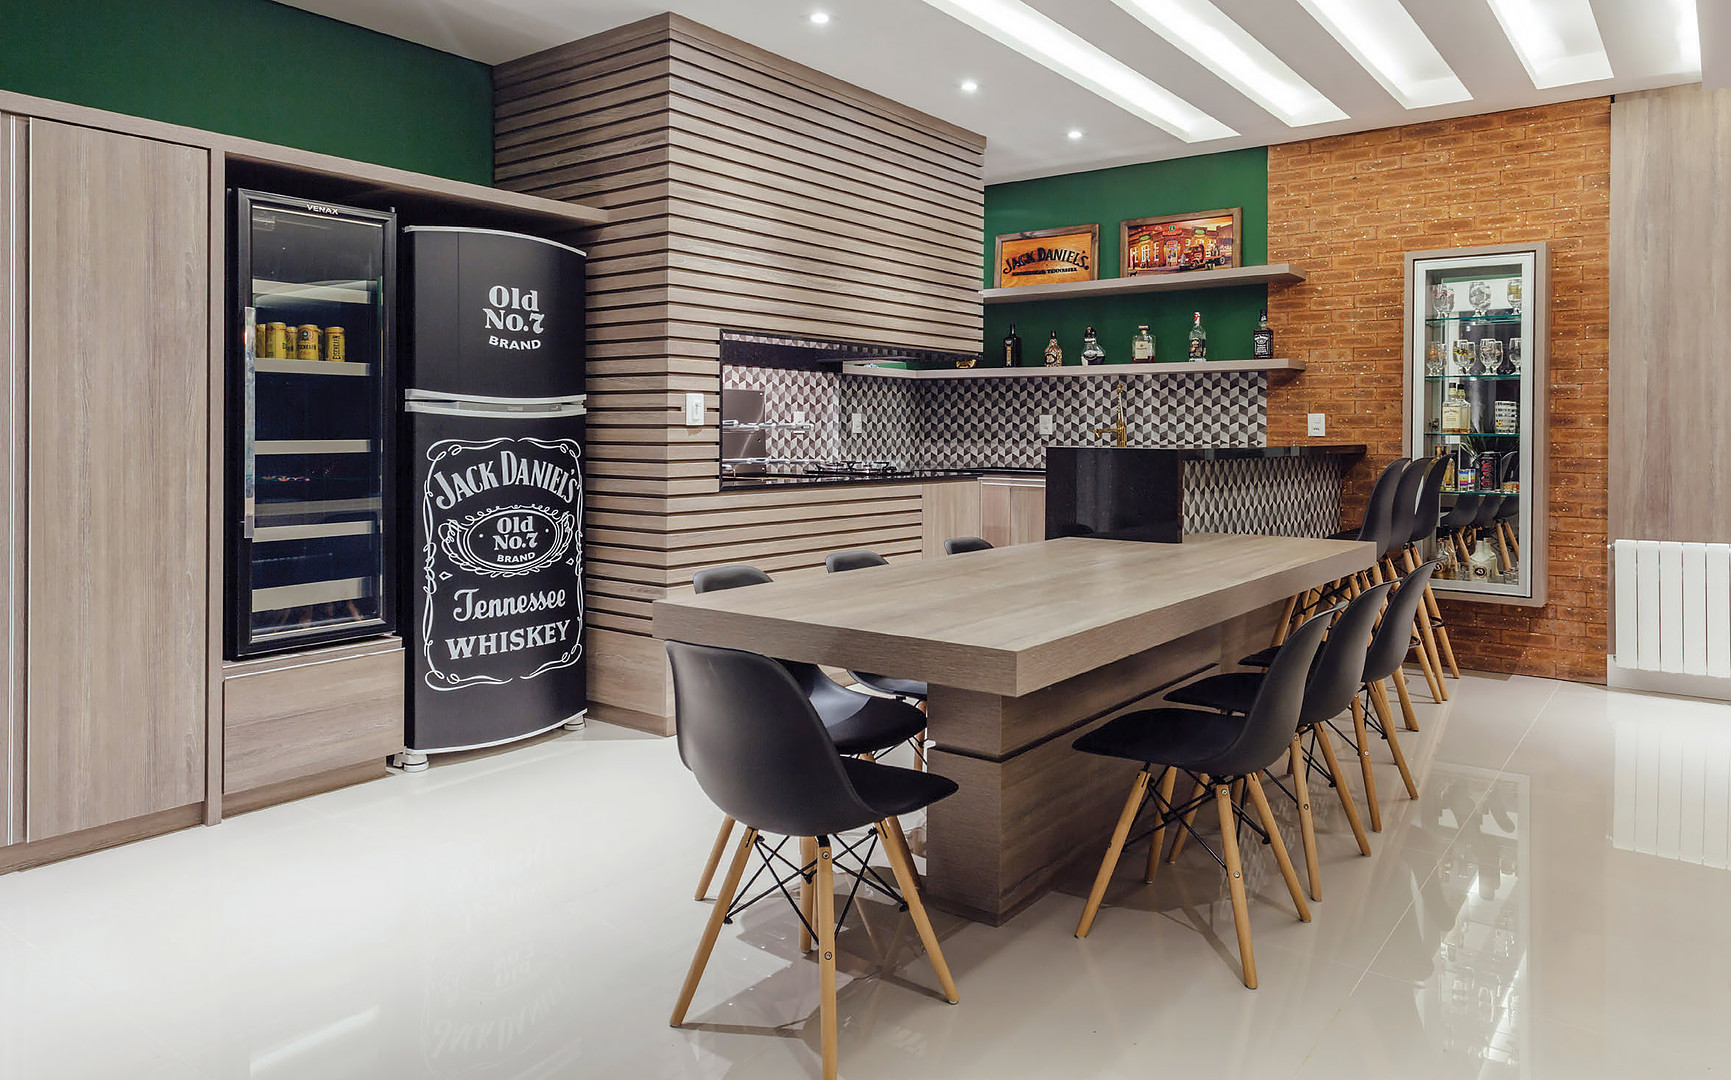 Benvenutti & Pivetta residencia AM (3).j